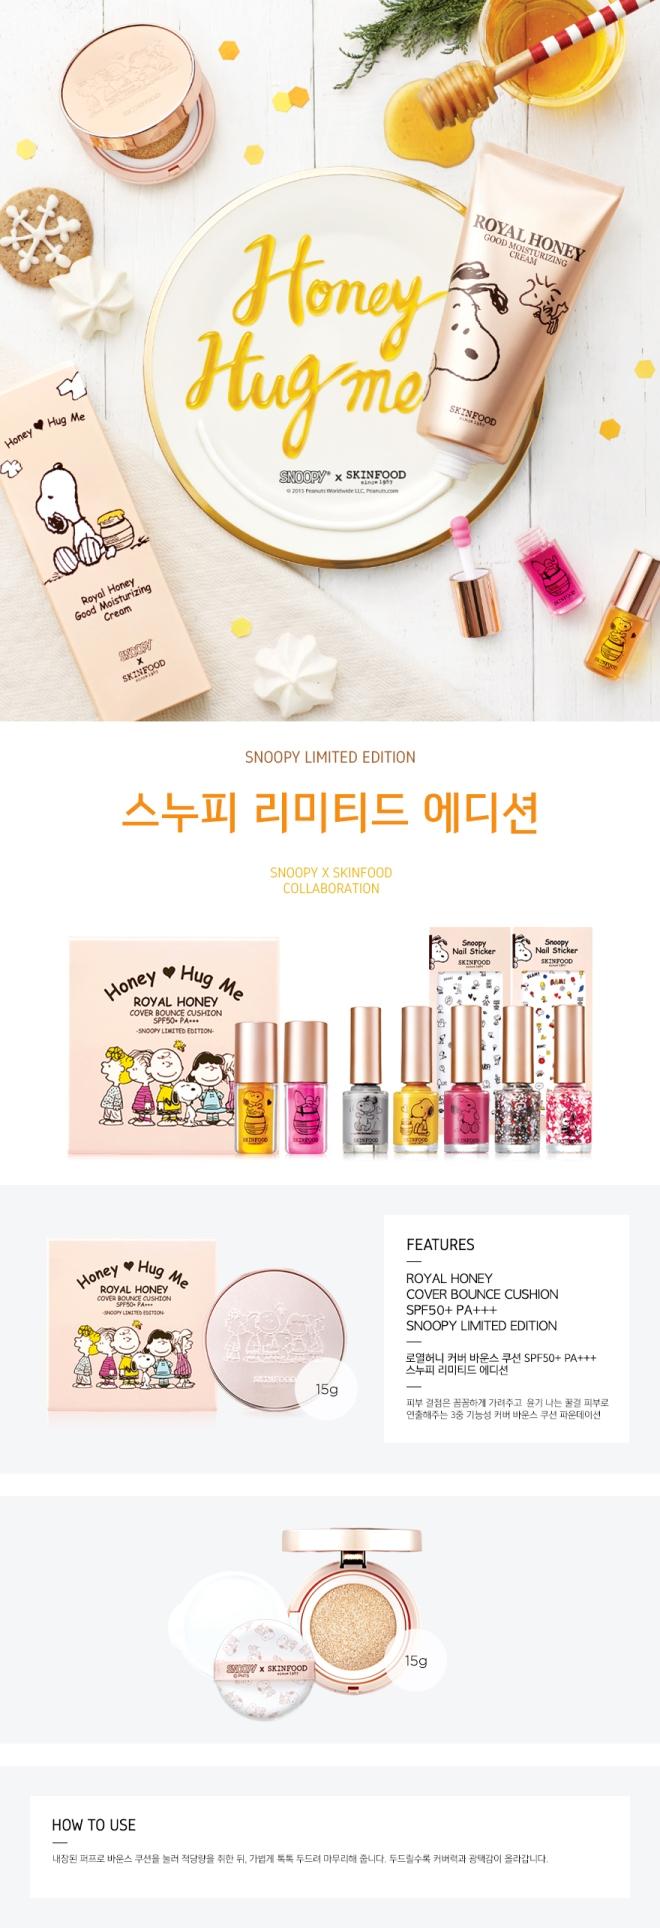 Skinfood Royal Honey Cover Bounce Cushion SPF50+ PA+++ (Info - kr)